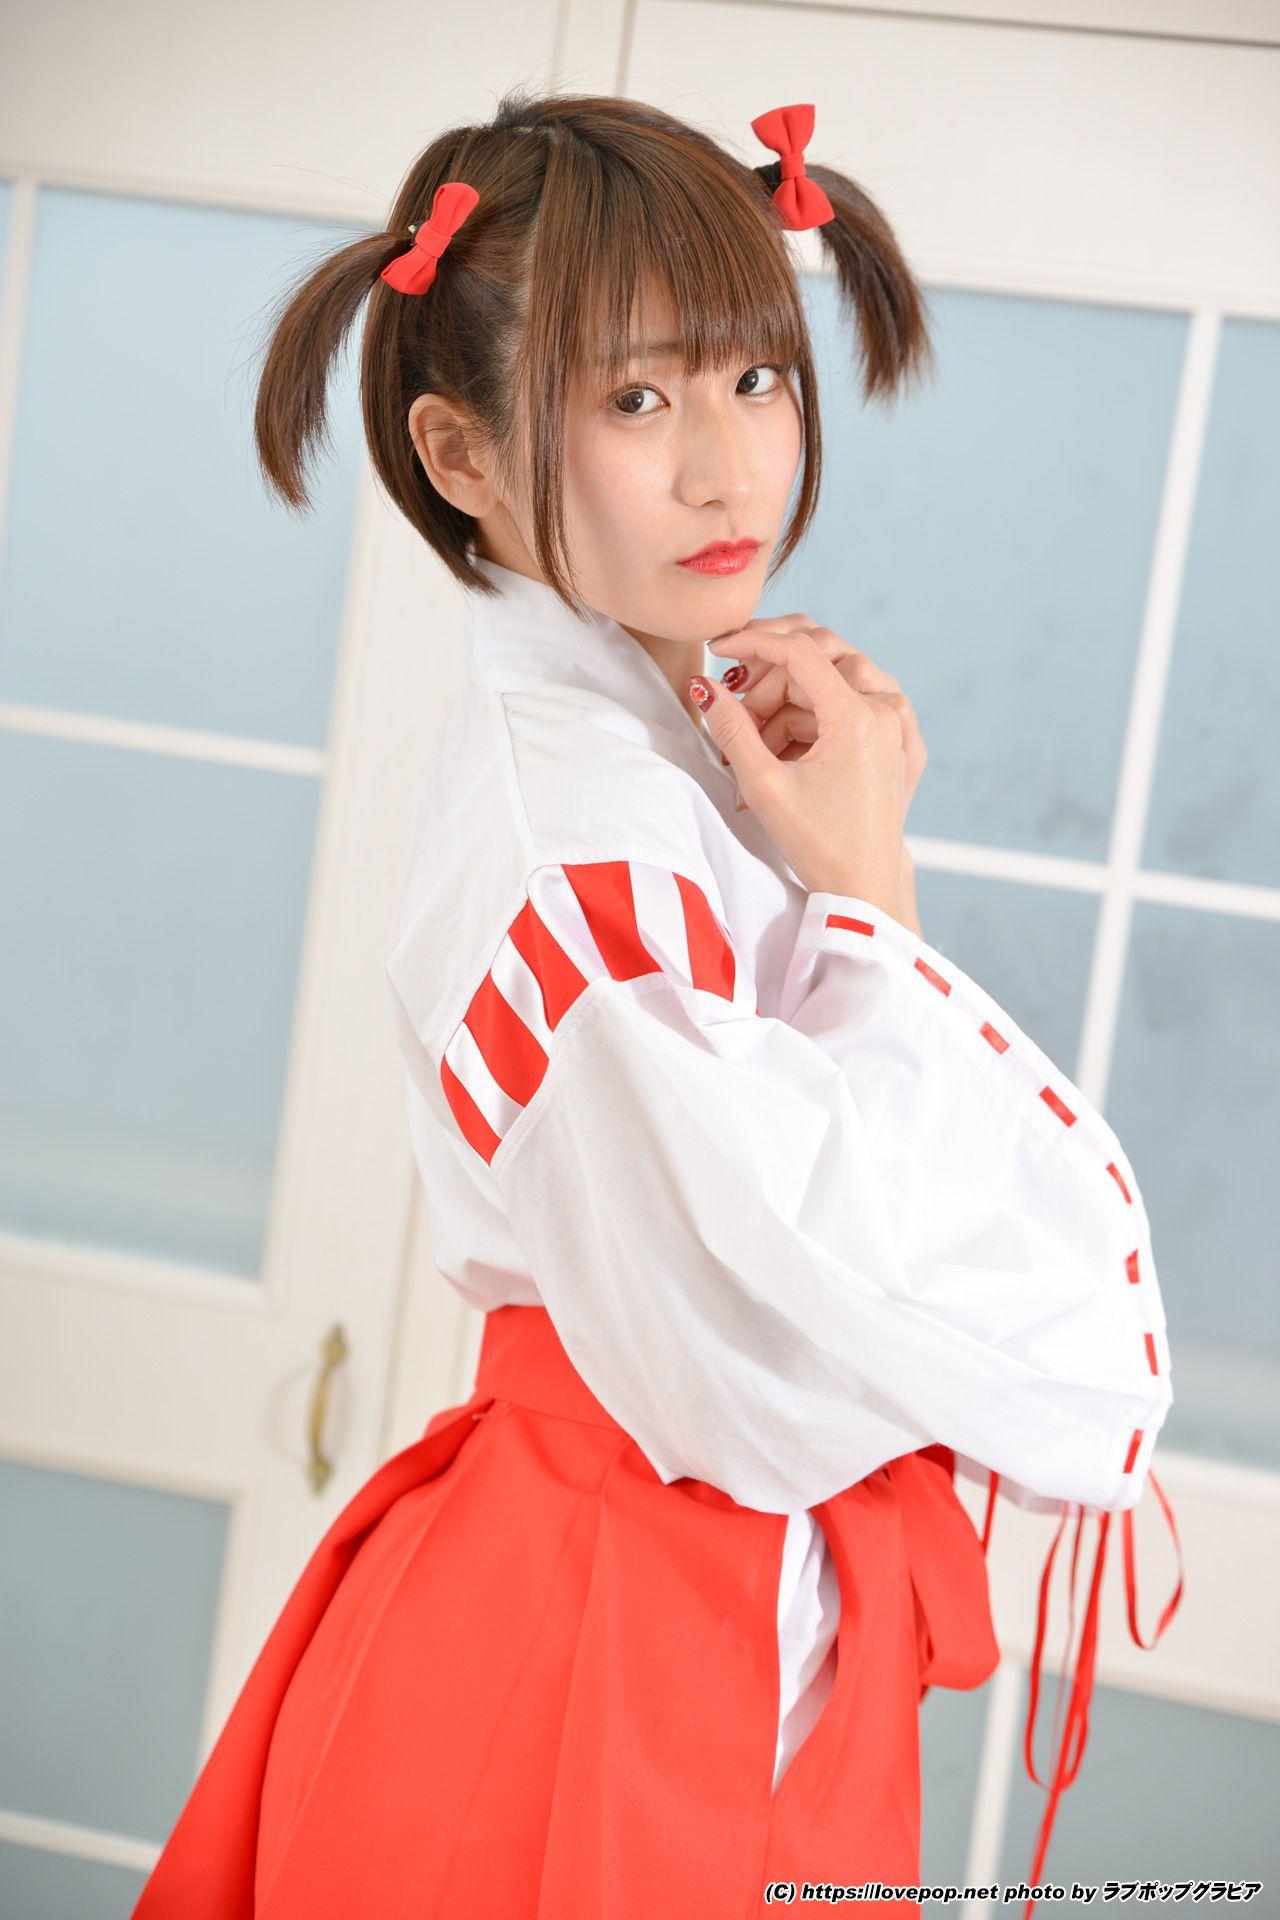 [LOVEPOP] Usako Kurusu 来栖うさこ Photoset 01 写真集[68P]插图(11)